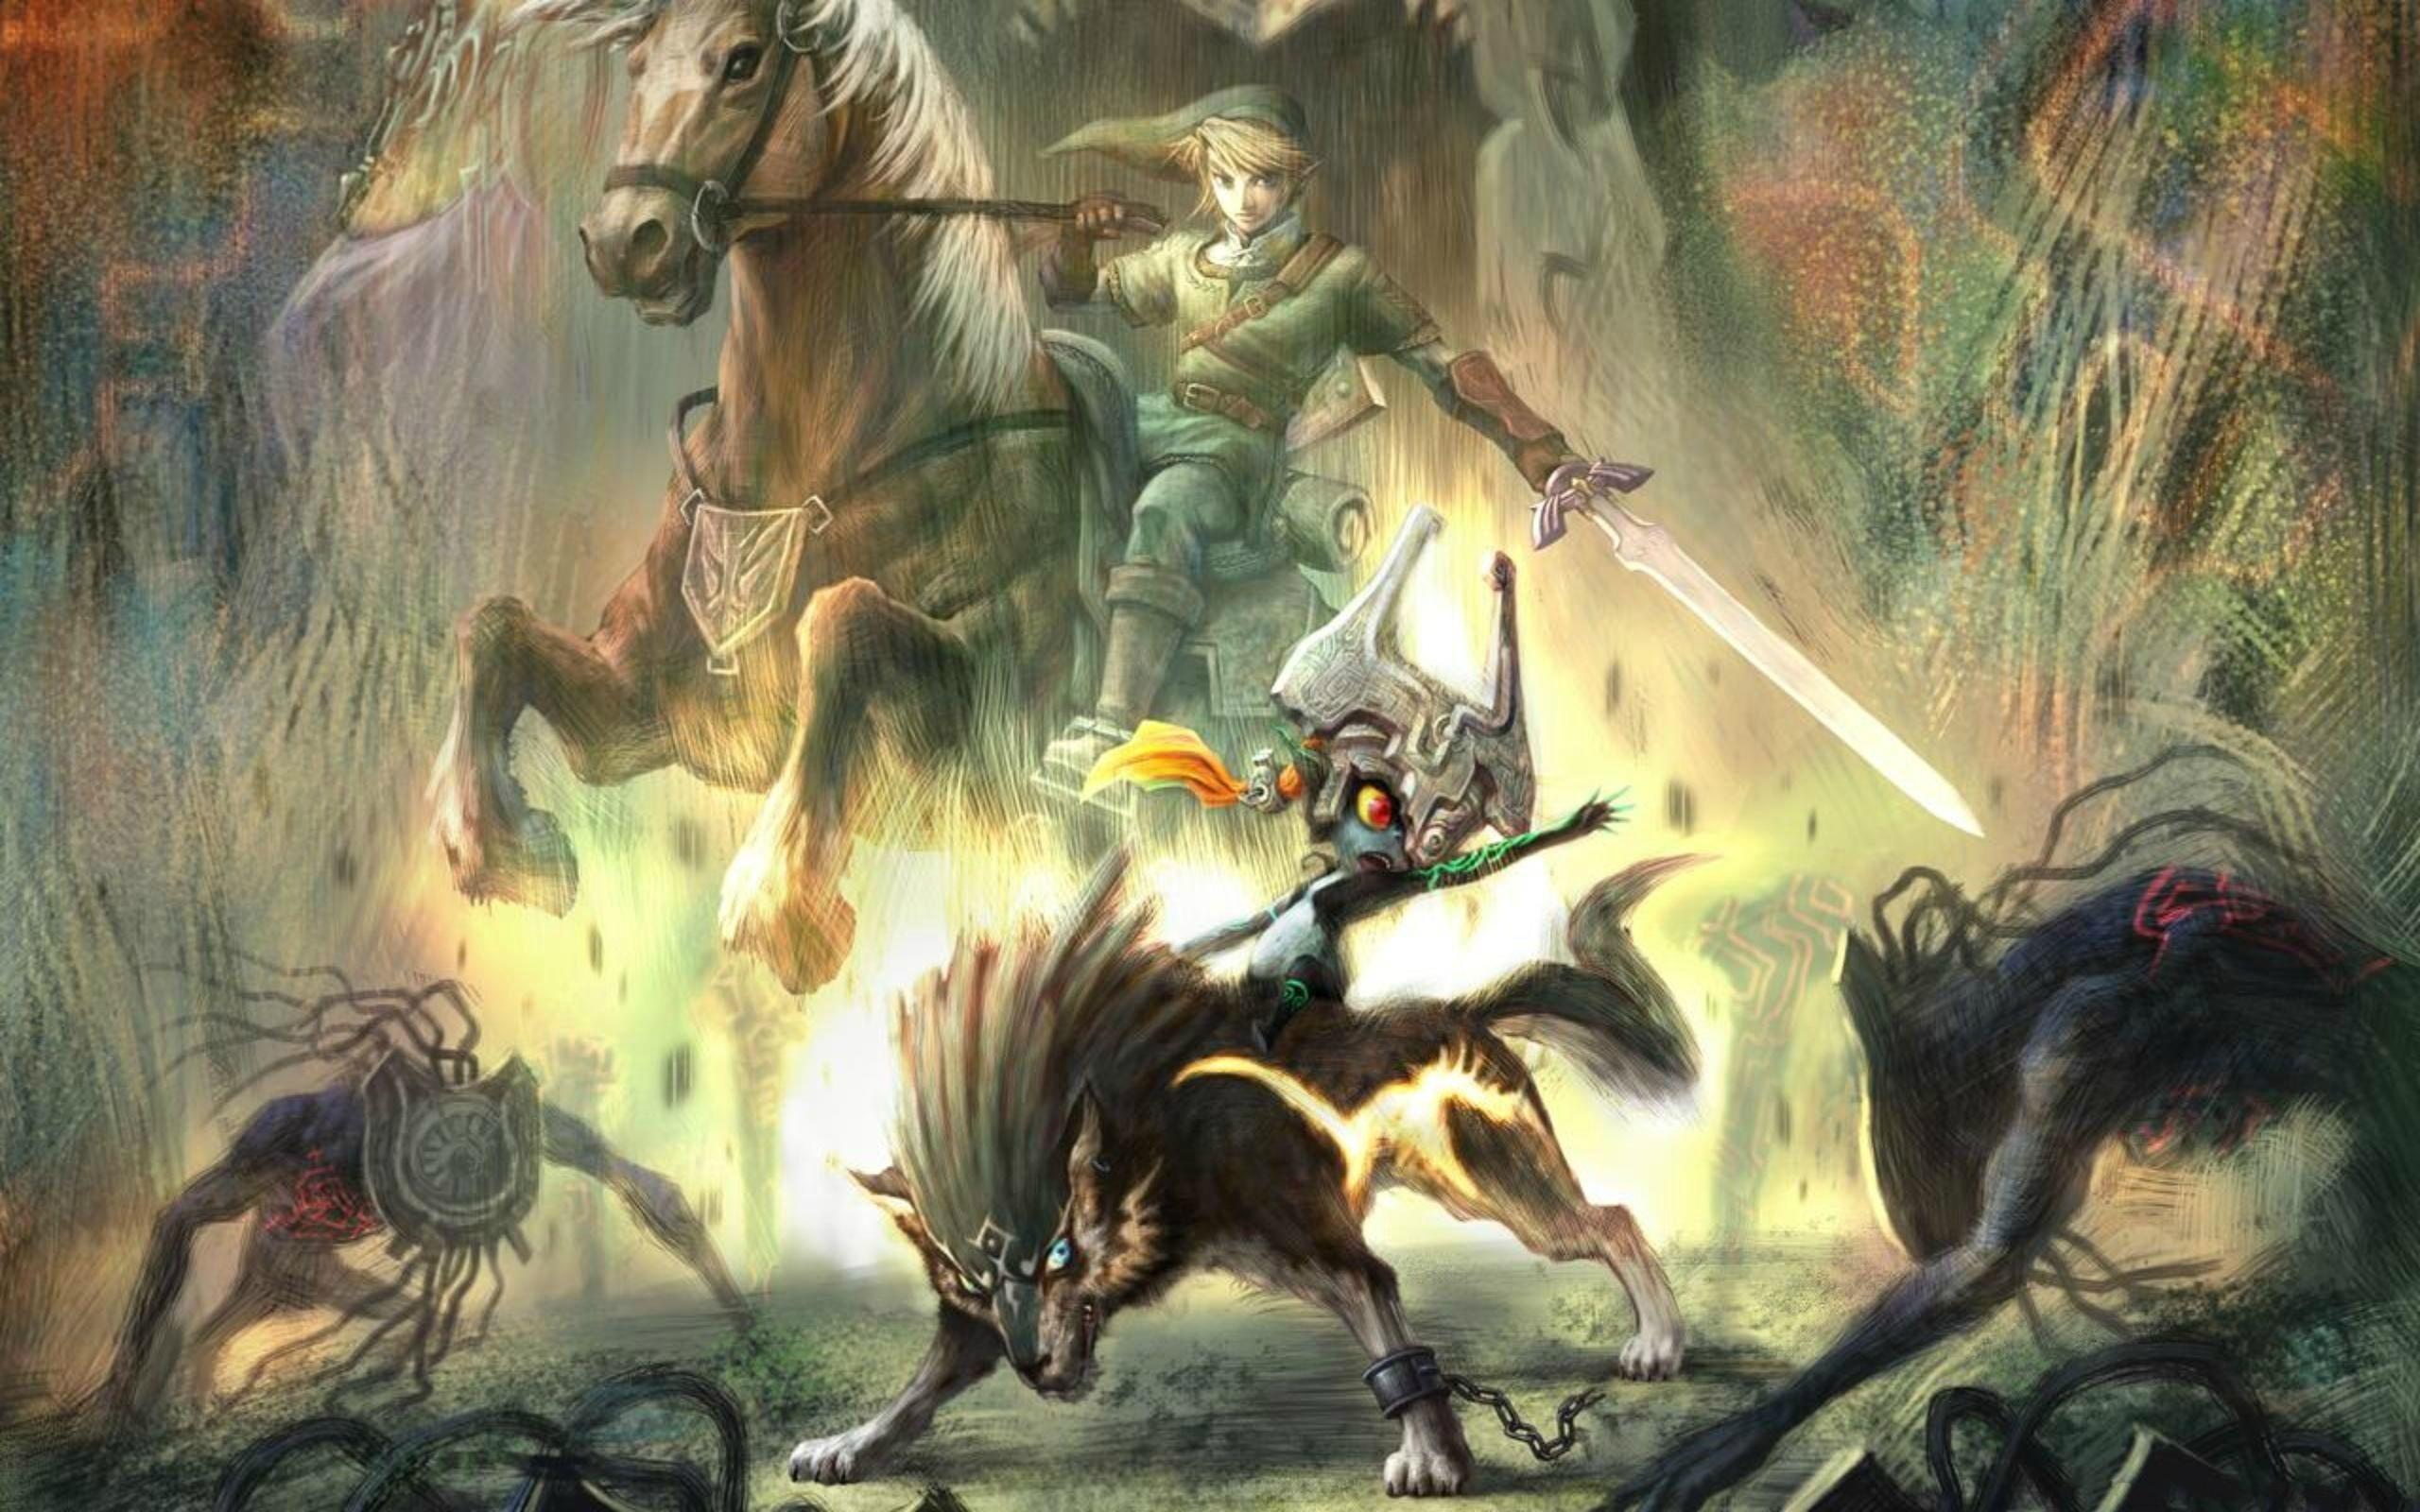 wallpaper.wiki-Free-Download-The-Legend-Of-Zelda-